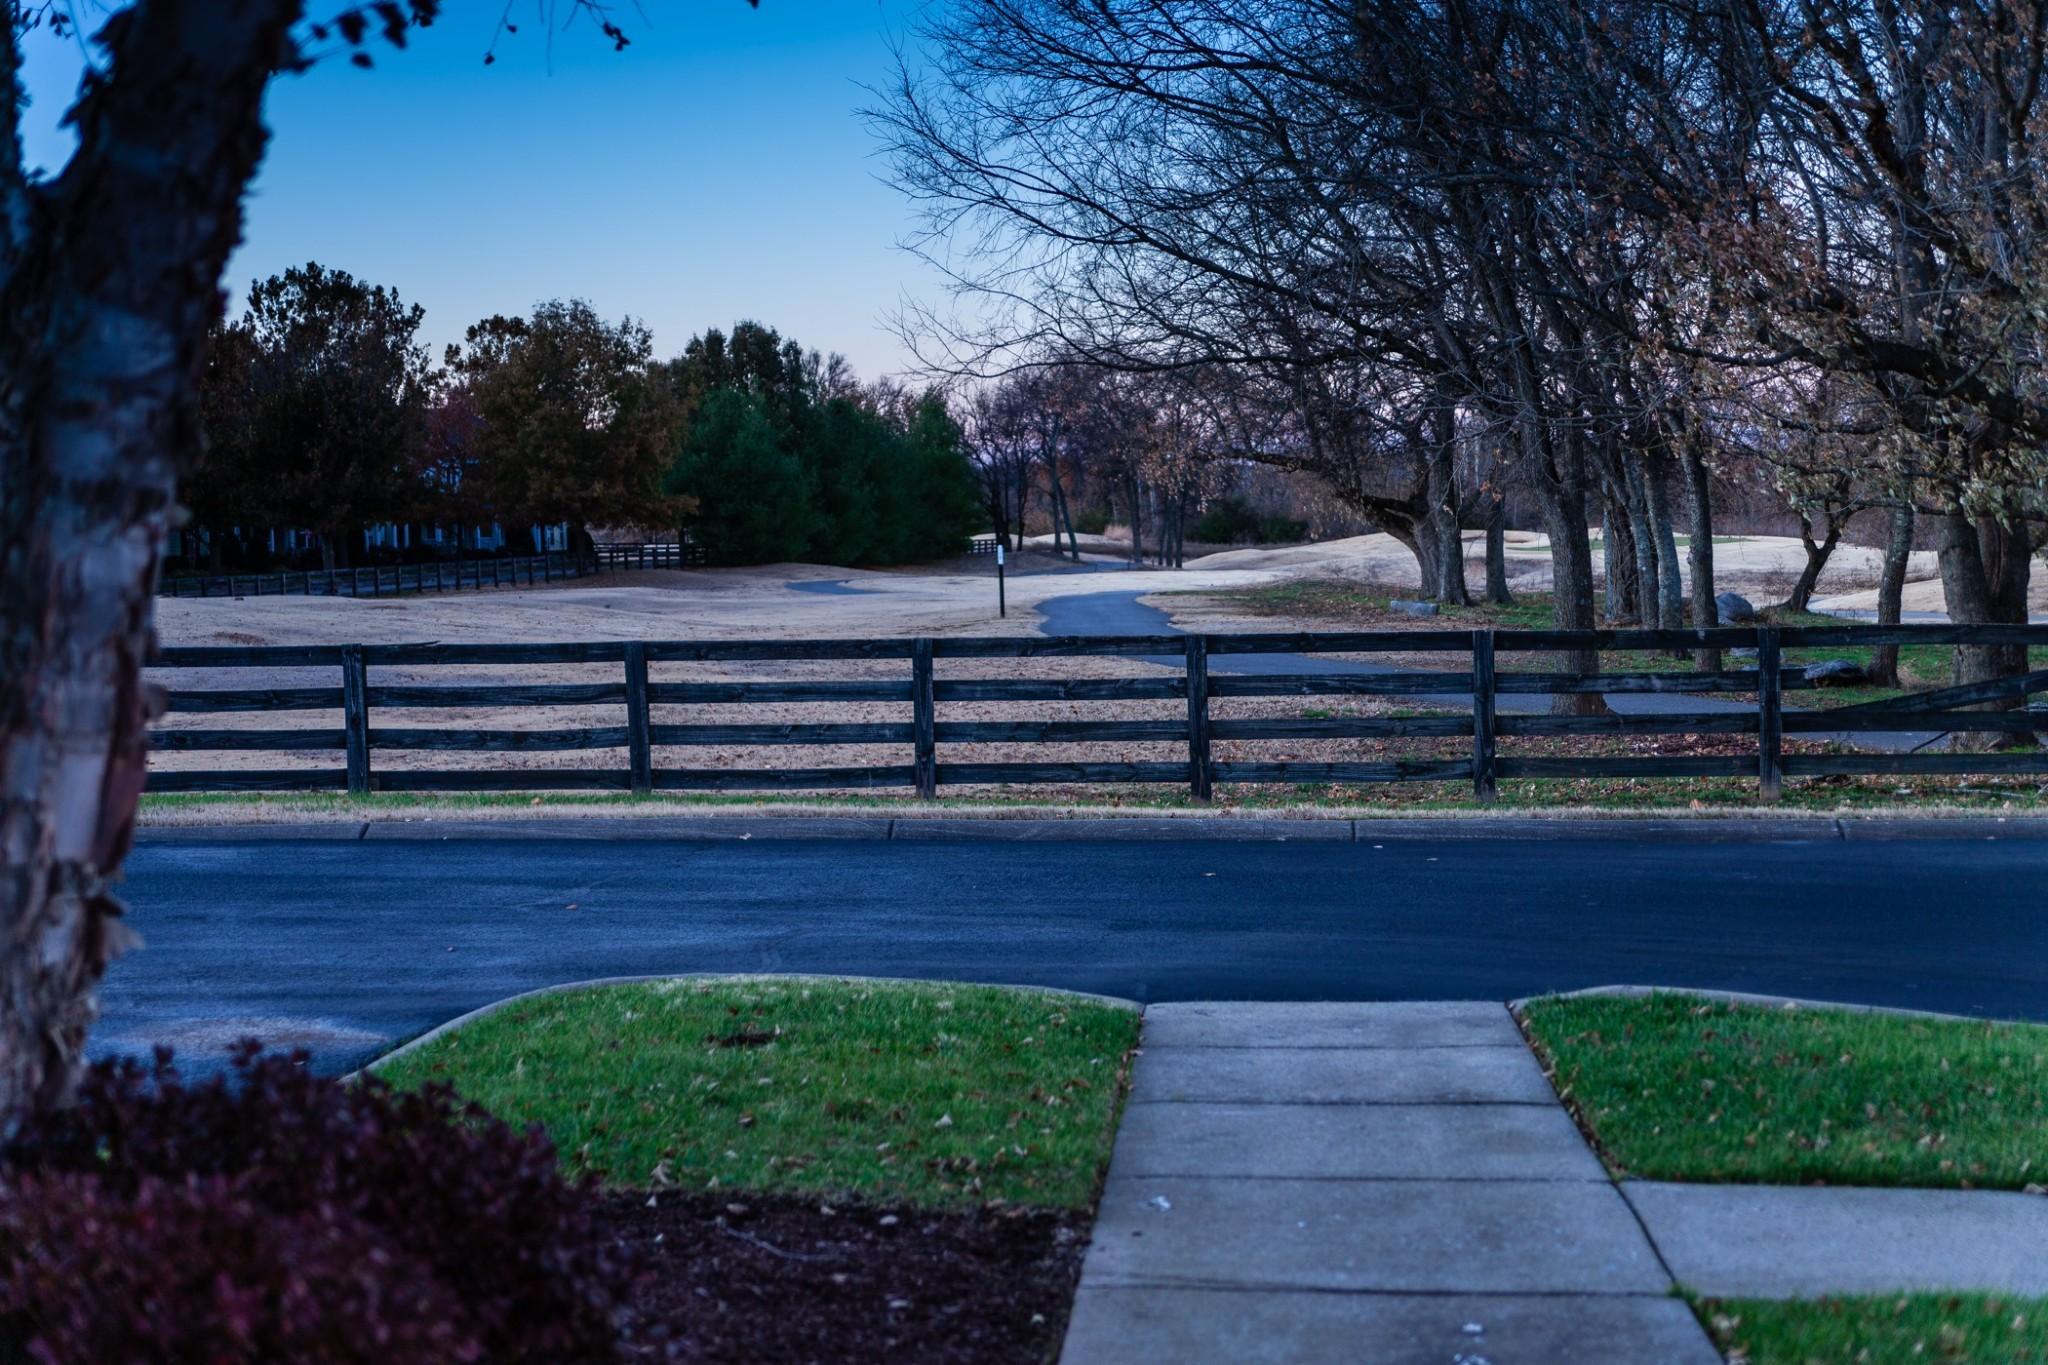 4000 Deer Creek Blvd, Spring Hill, Tennessee